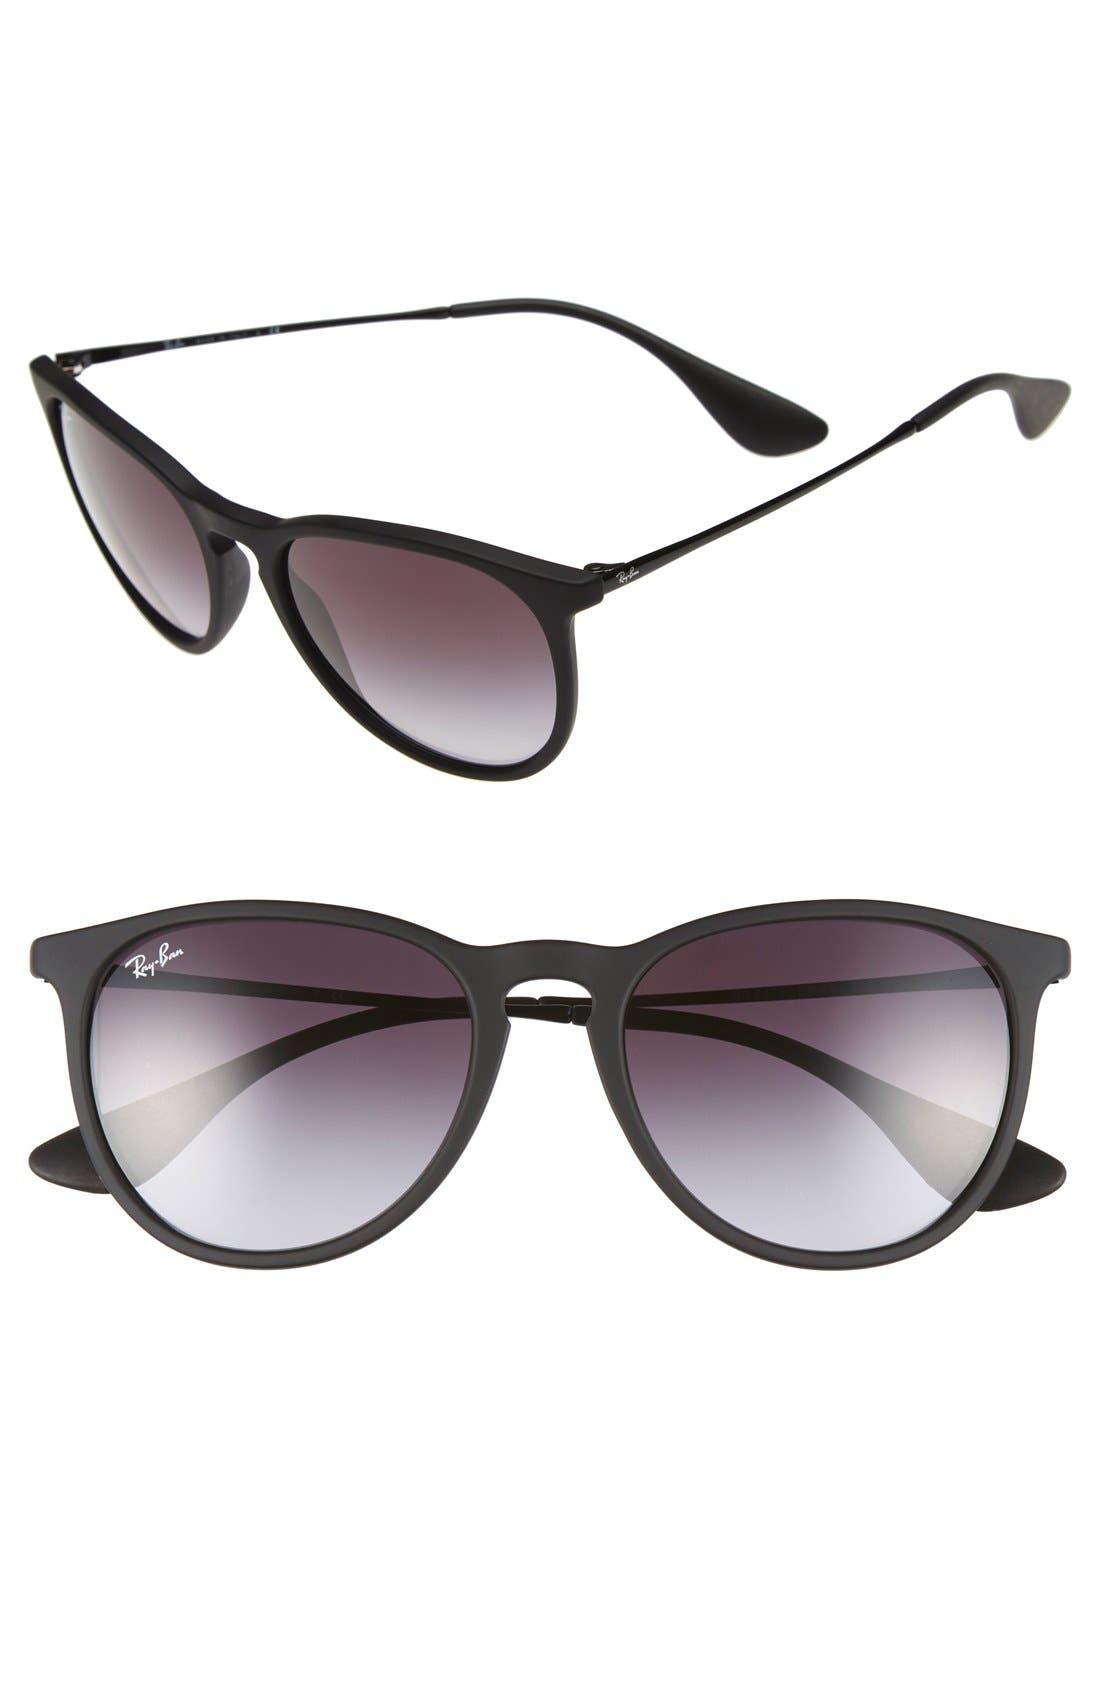 Ray-Ban 5m Keyhole Sunglasses -